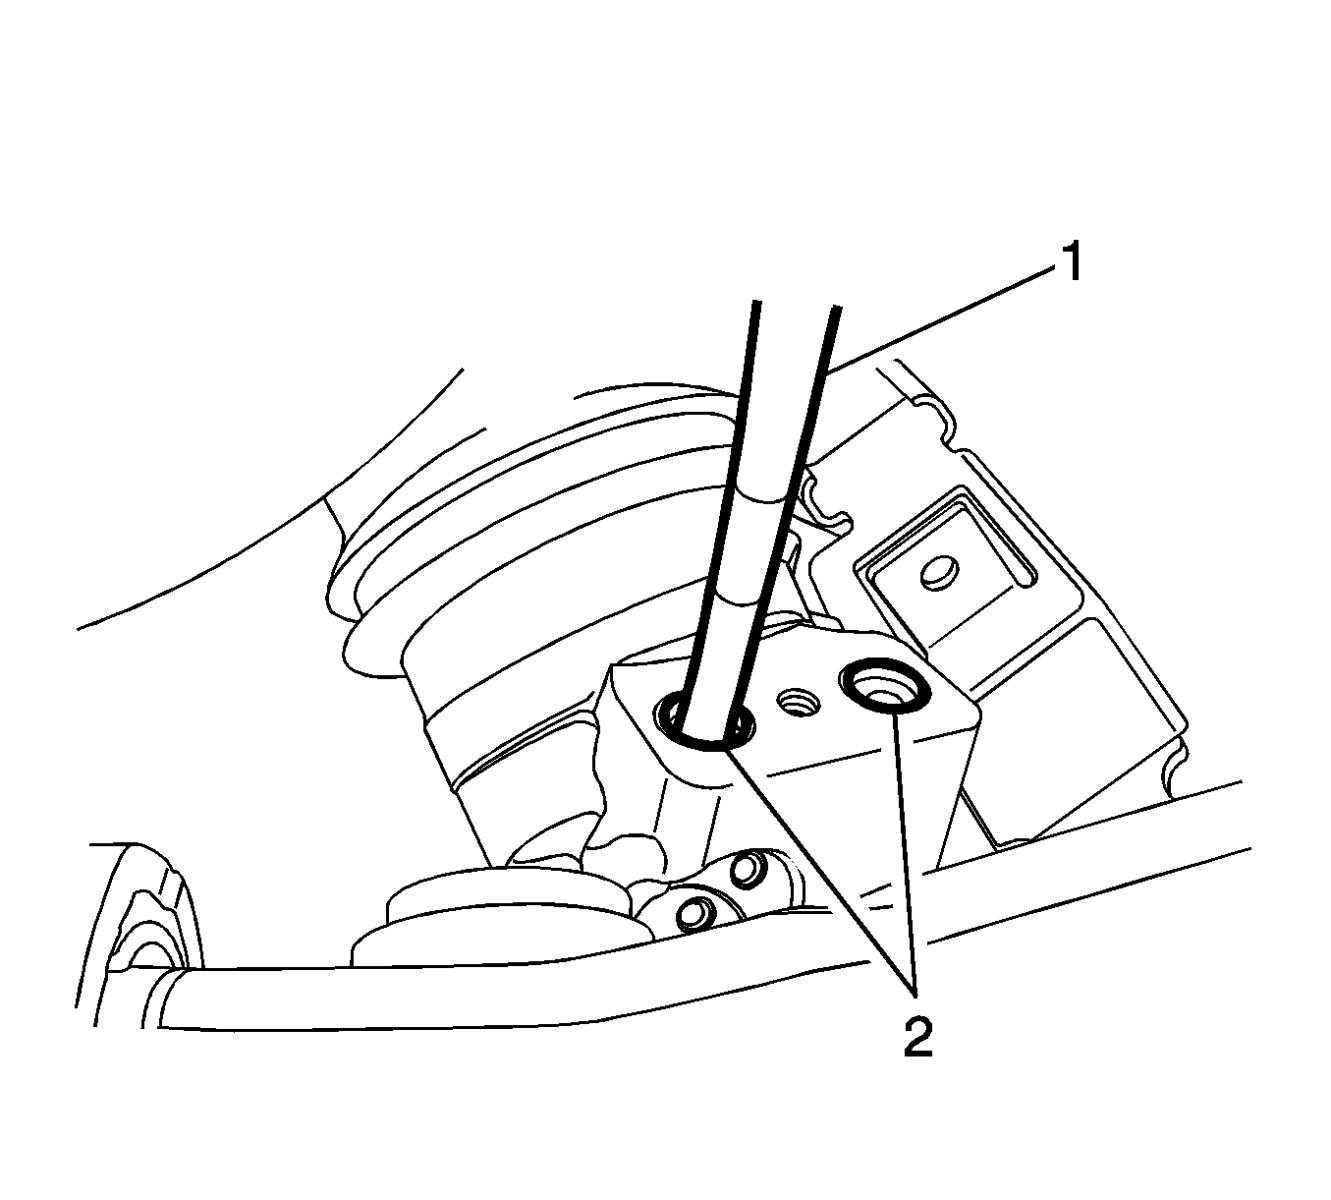 07 02 32 002n Hydraulic Power Steering System Leak